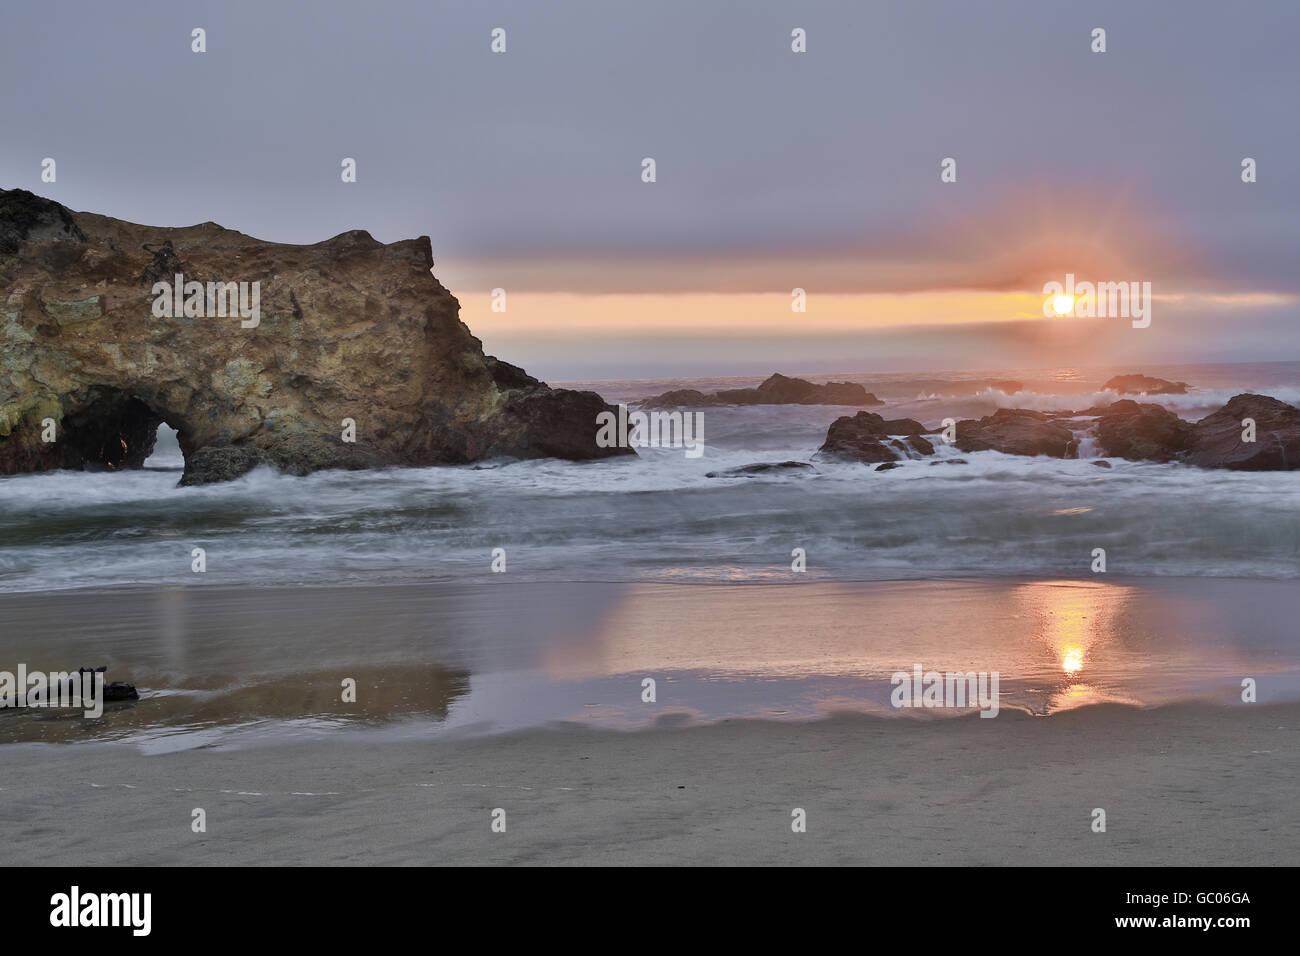 Sun shines through overcast sky in Pescadero State Beach. - Stock Image